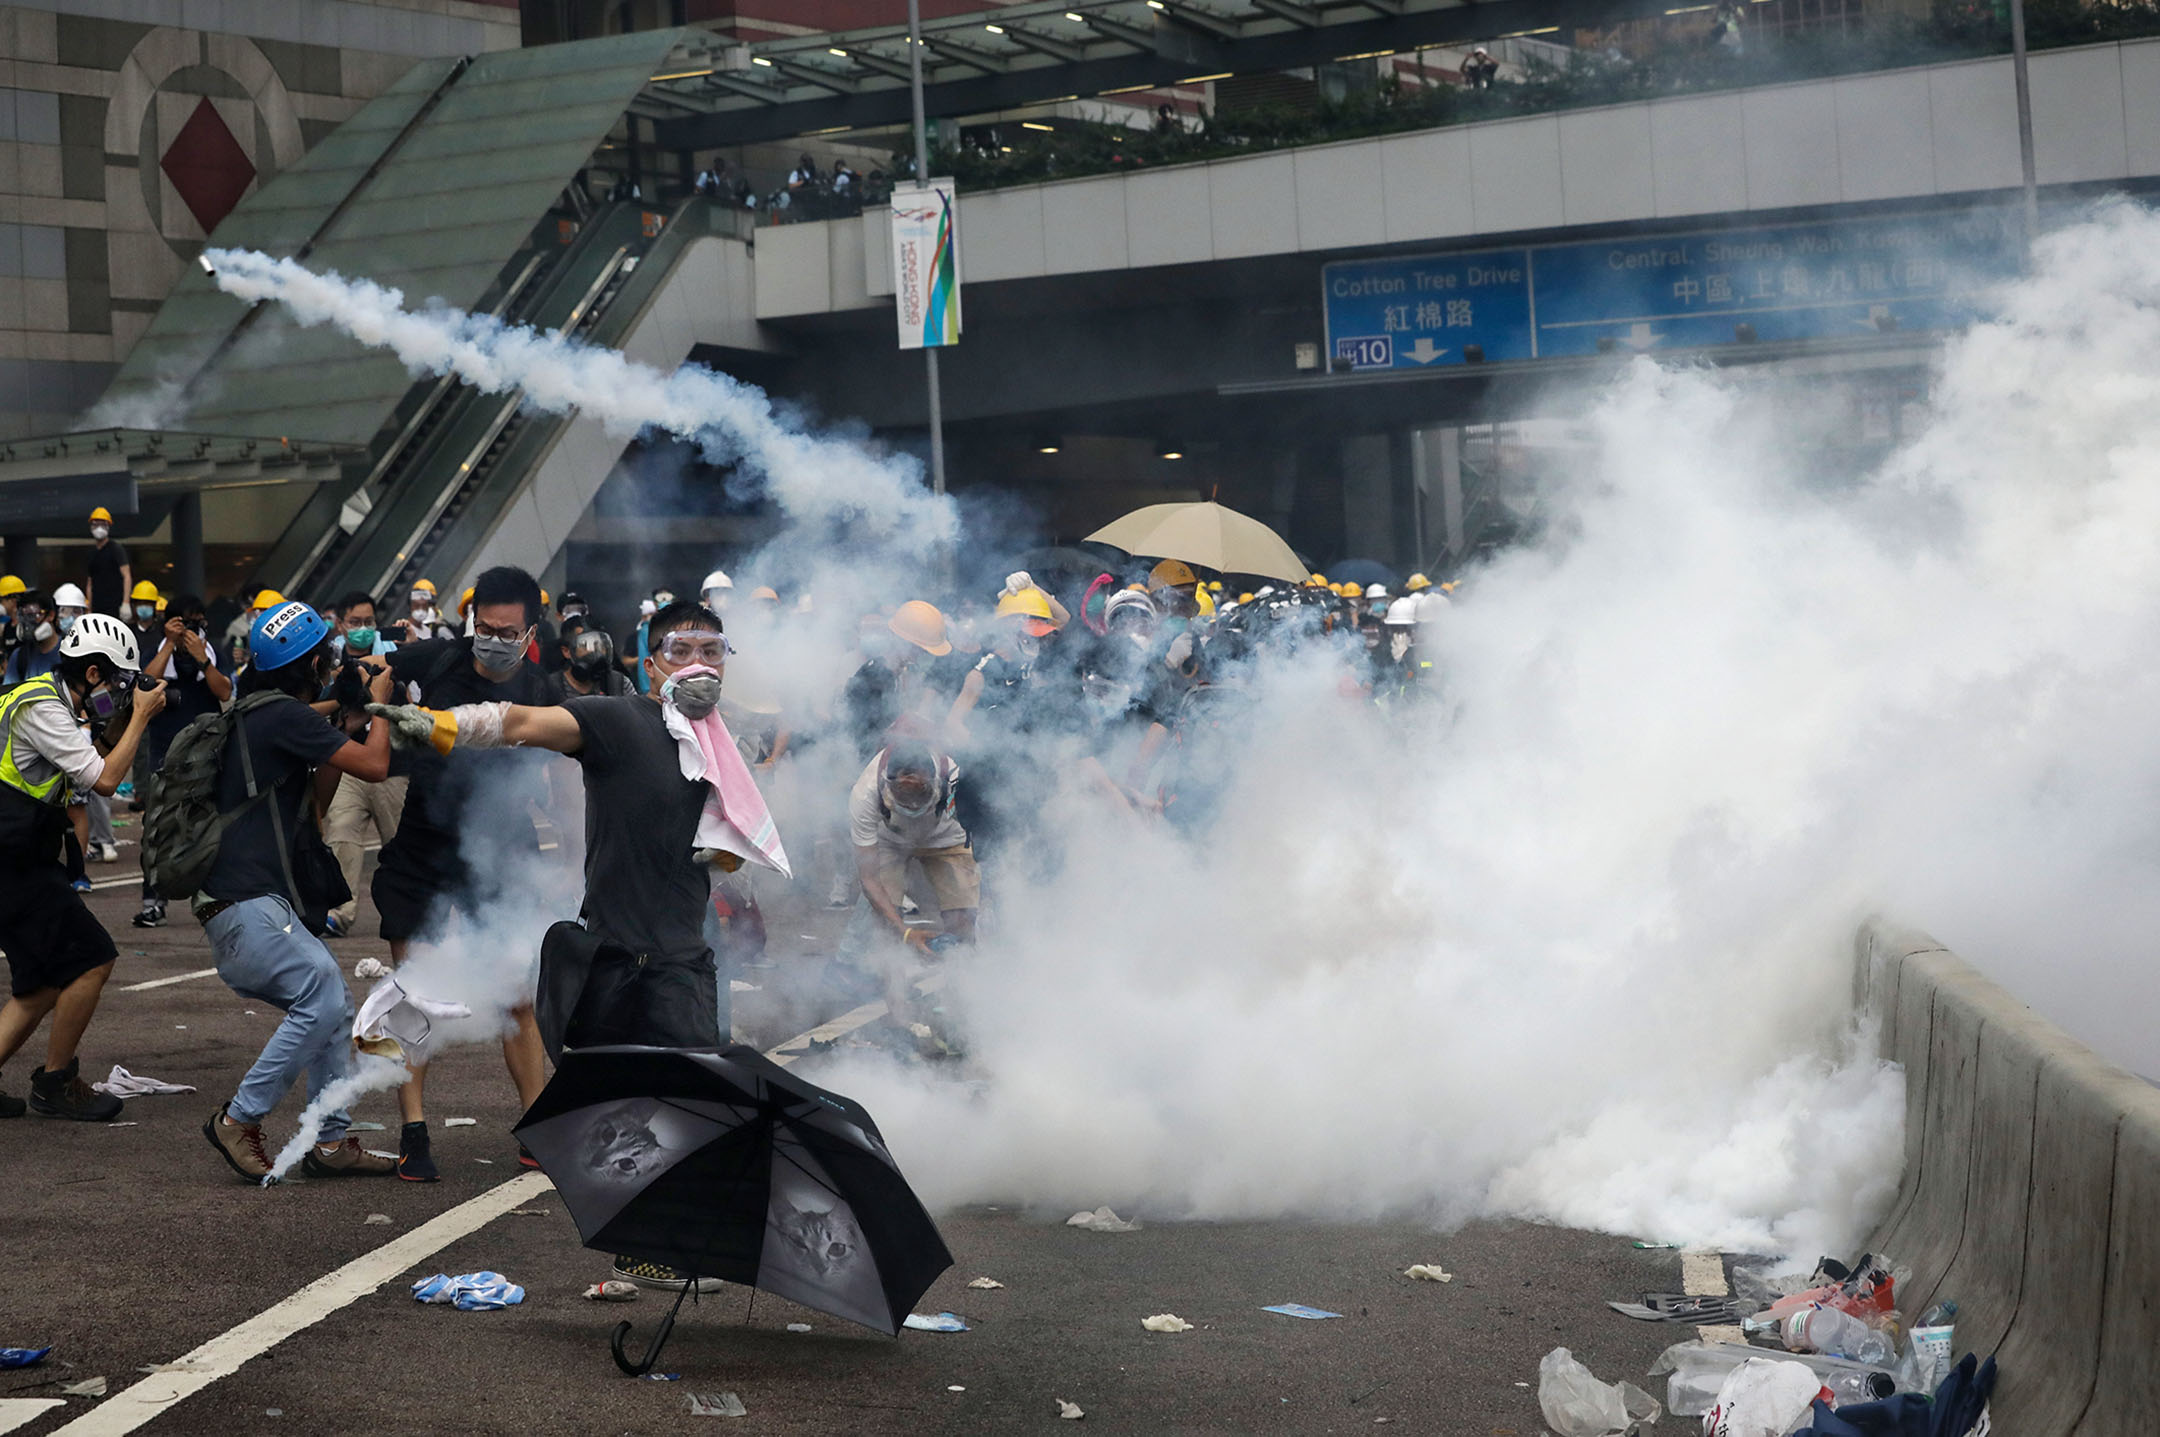 2019年6月12日香港金鐘,一名示威者在催淚彈的煙霧中。 攝:Sam Tsang/South China Morning Post via Getty Images